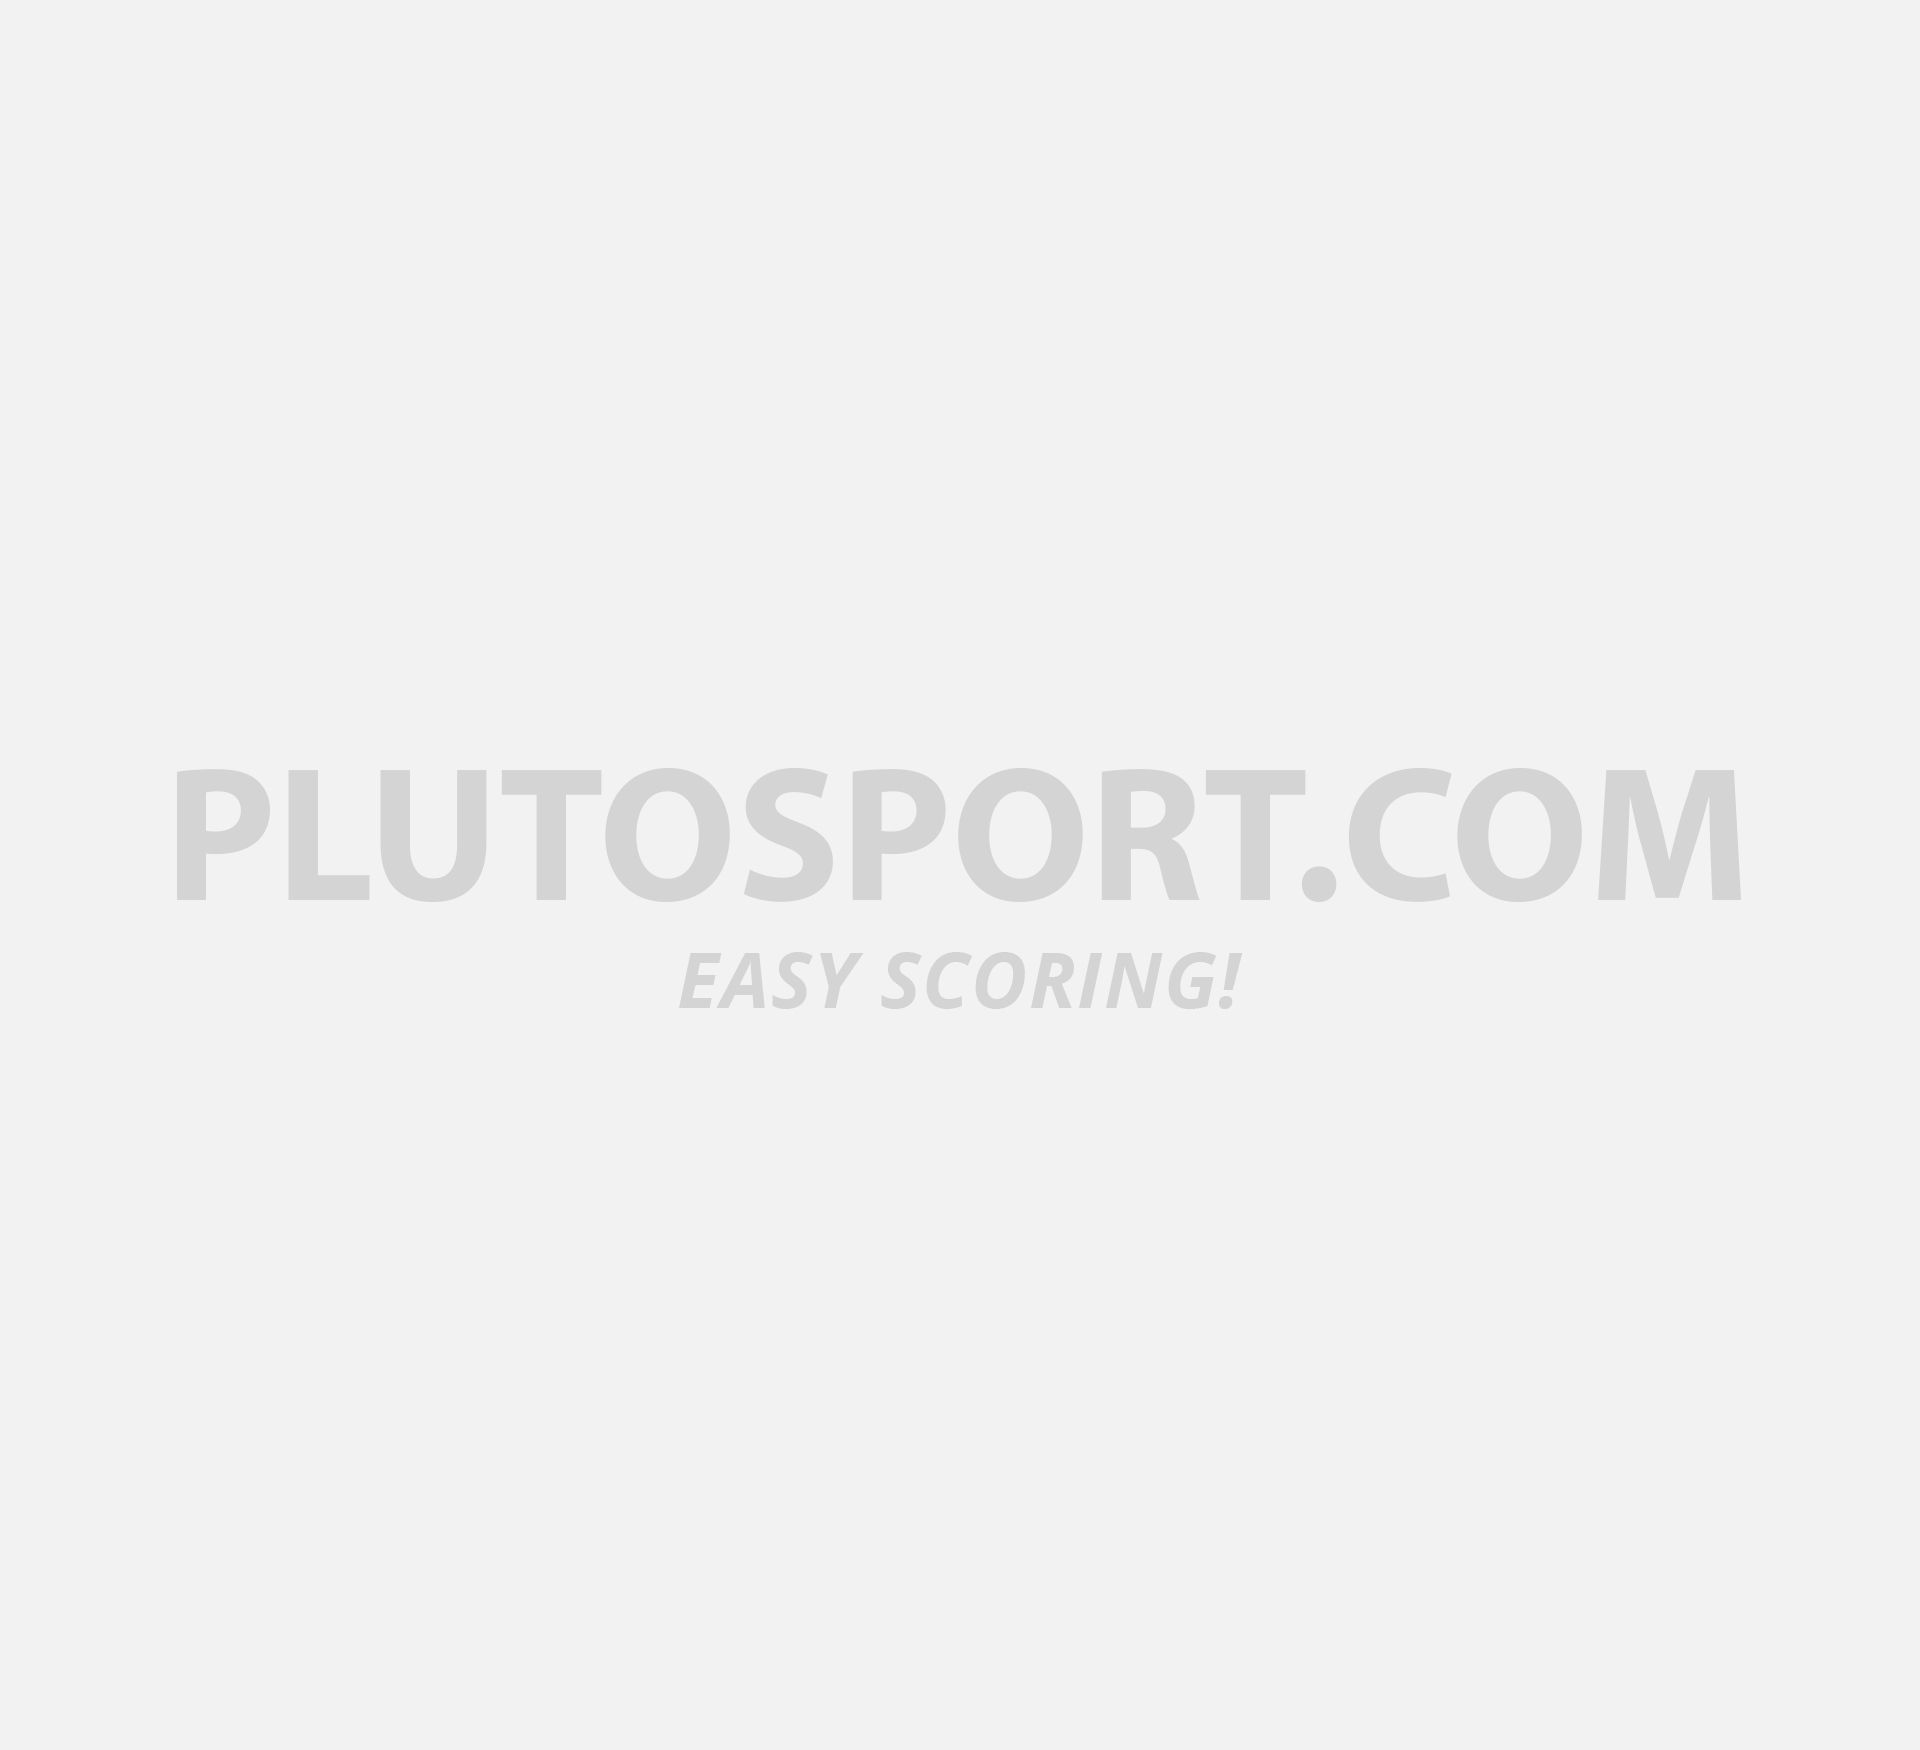 Hombres Adidas Nitrocharge 3.0 Trx Tf Opinión Cornamusa Fútbol dYcq4